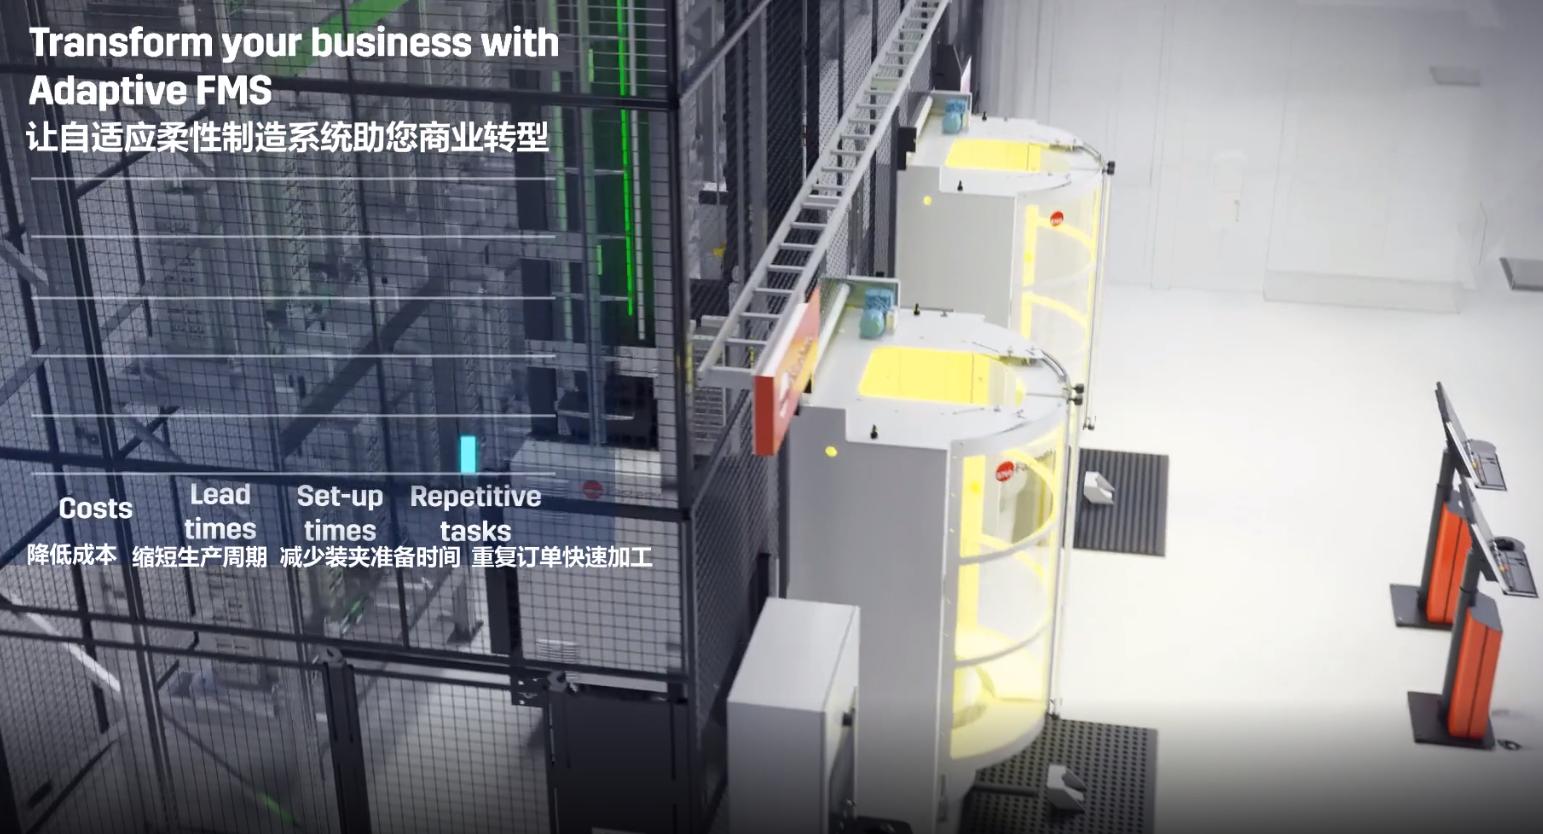 FMS柔性制造单元系统-助力中国制造业升级 FMS柔性化制造单元-解决方案 第3张